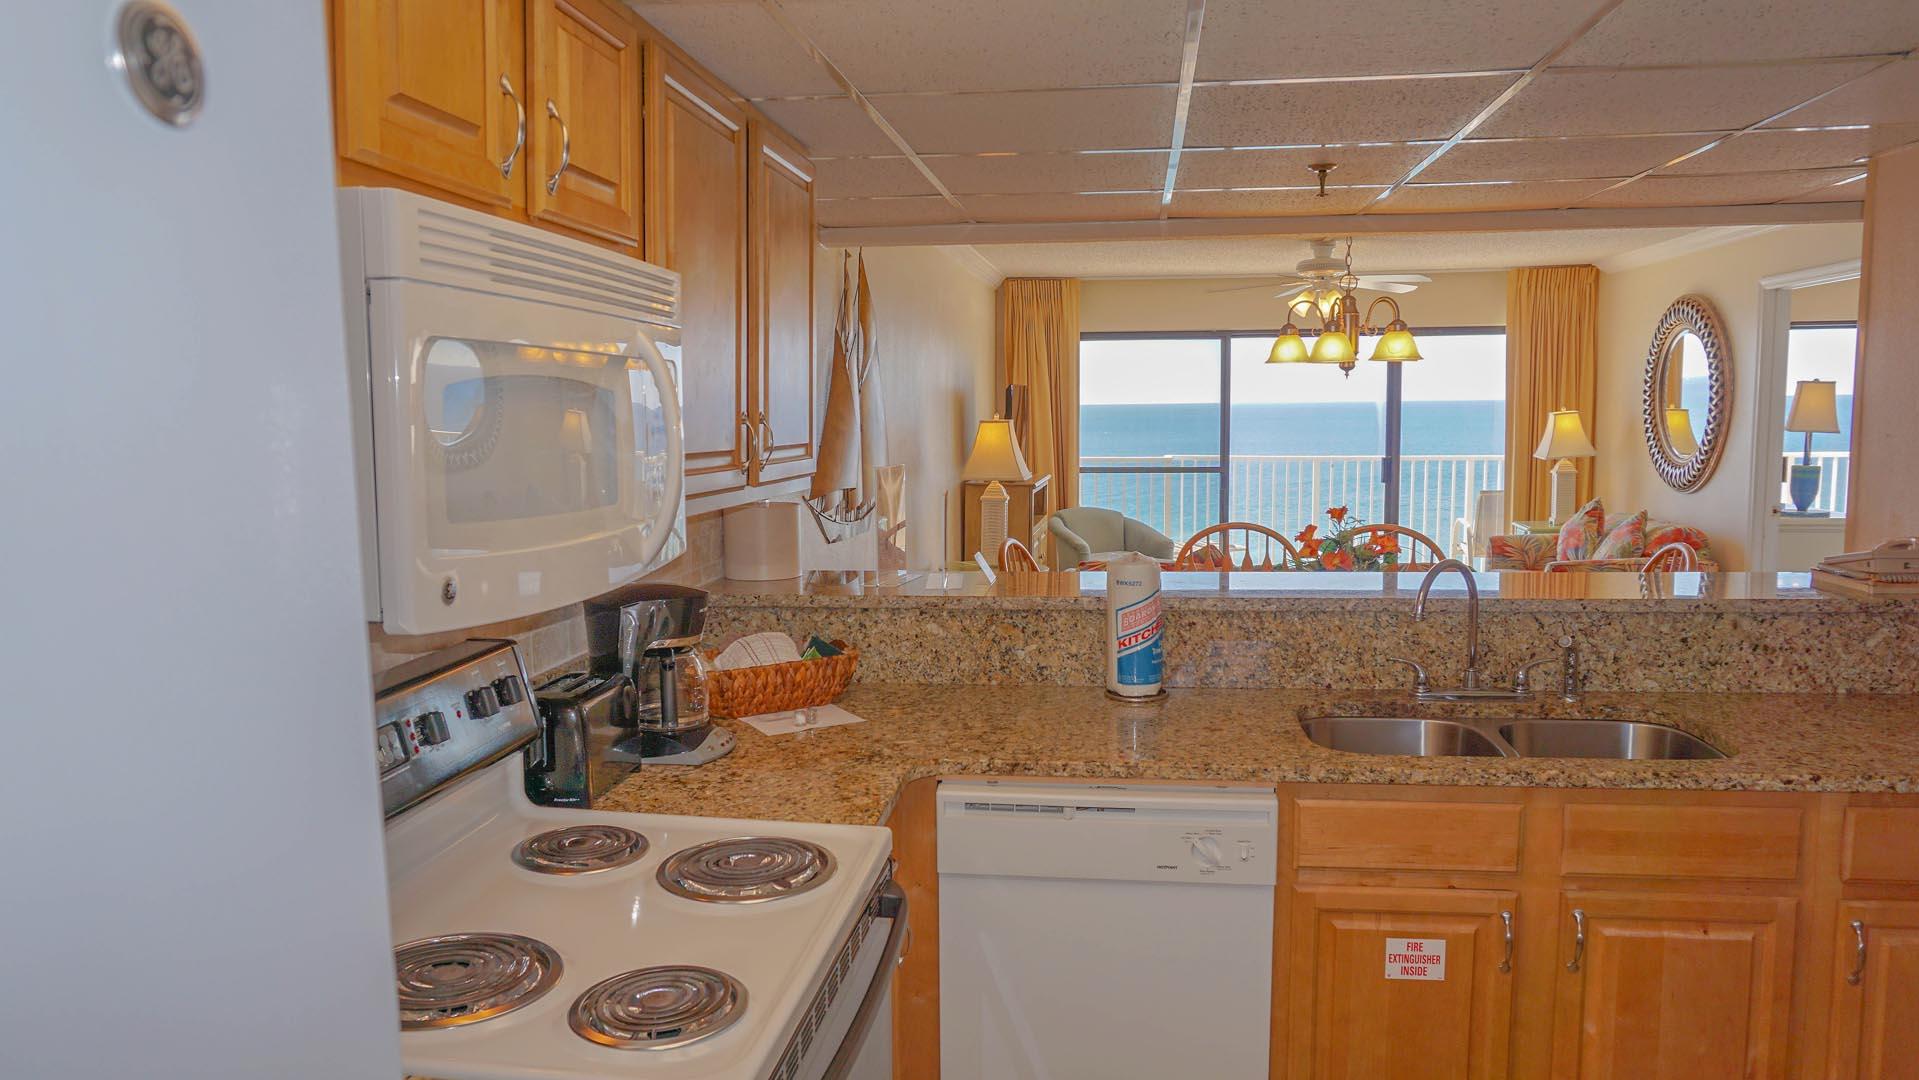 Landmark Holiday Beach Resort Kitchen